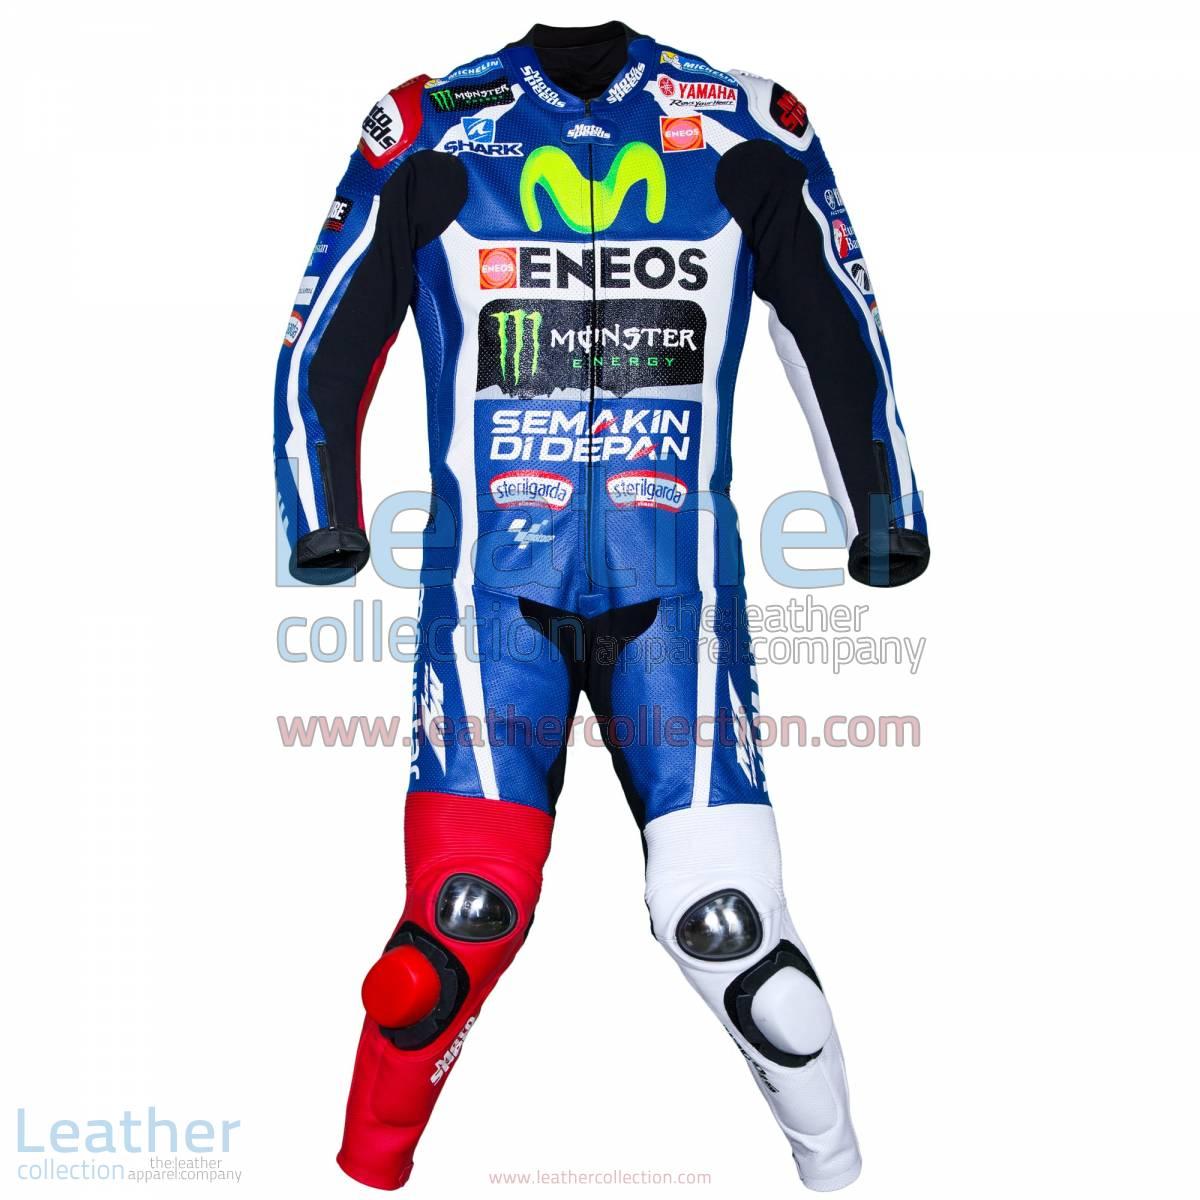 Jorge Lorenzo Movistar Yamaha MotoGP 2016 Leathers | Jorge Lorenzo